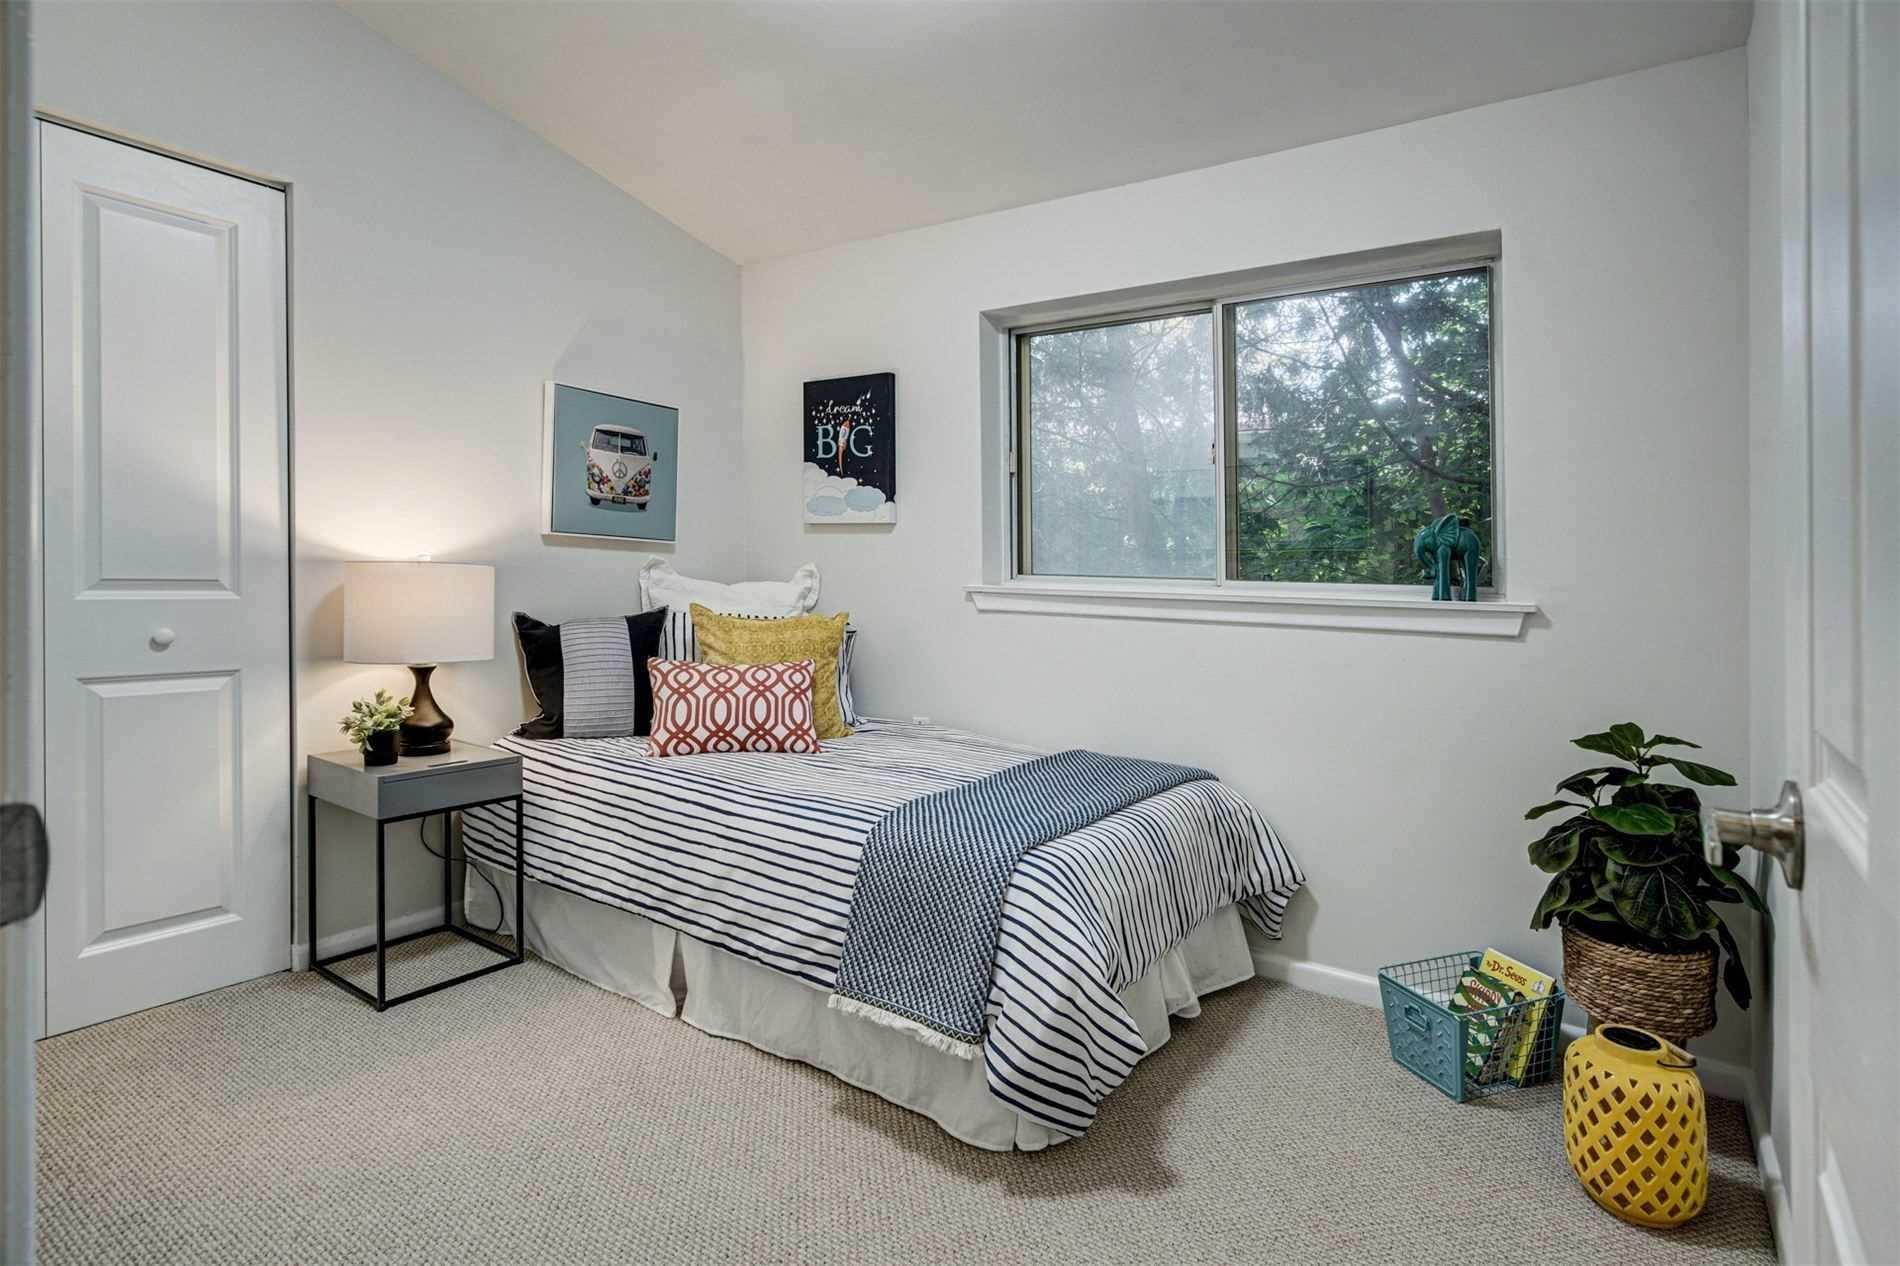 140 Verobeach Blvd - Humbermede Detached for sale, 3 Bedrooms (W5385046) - #20